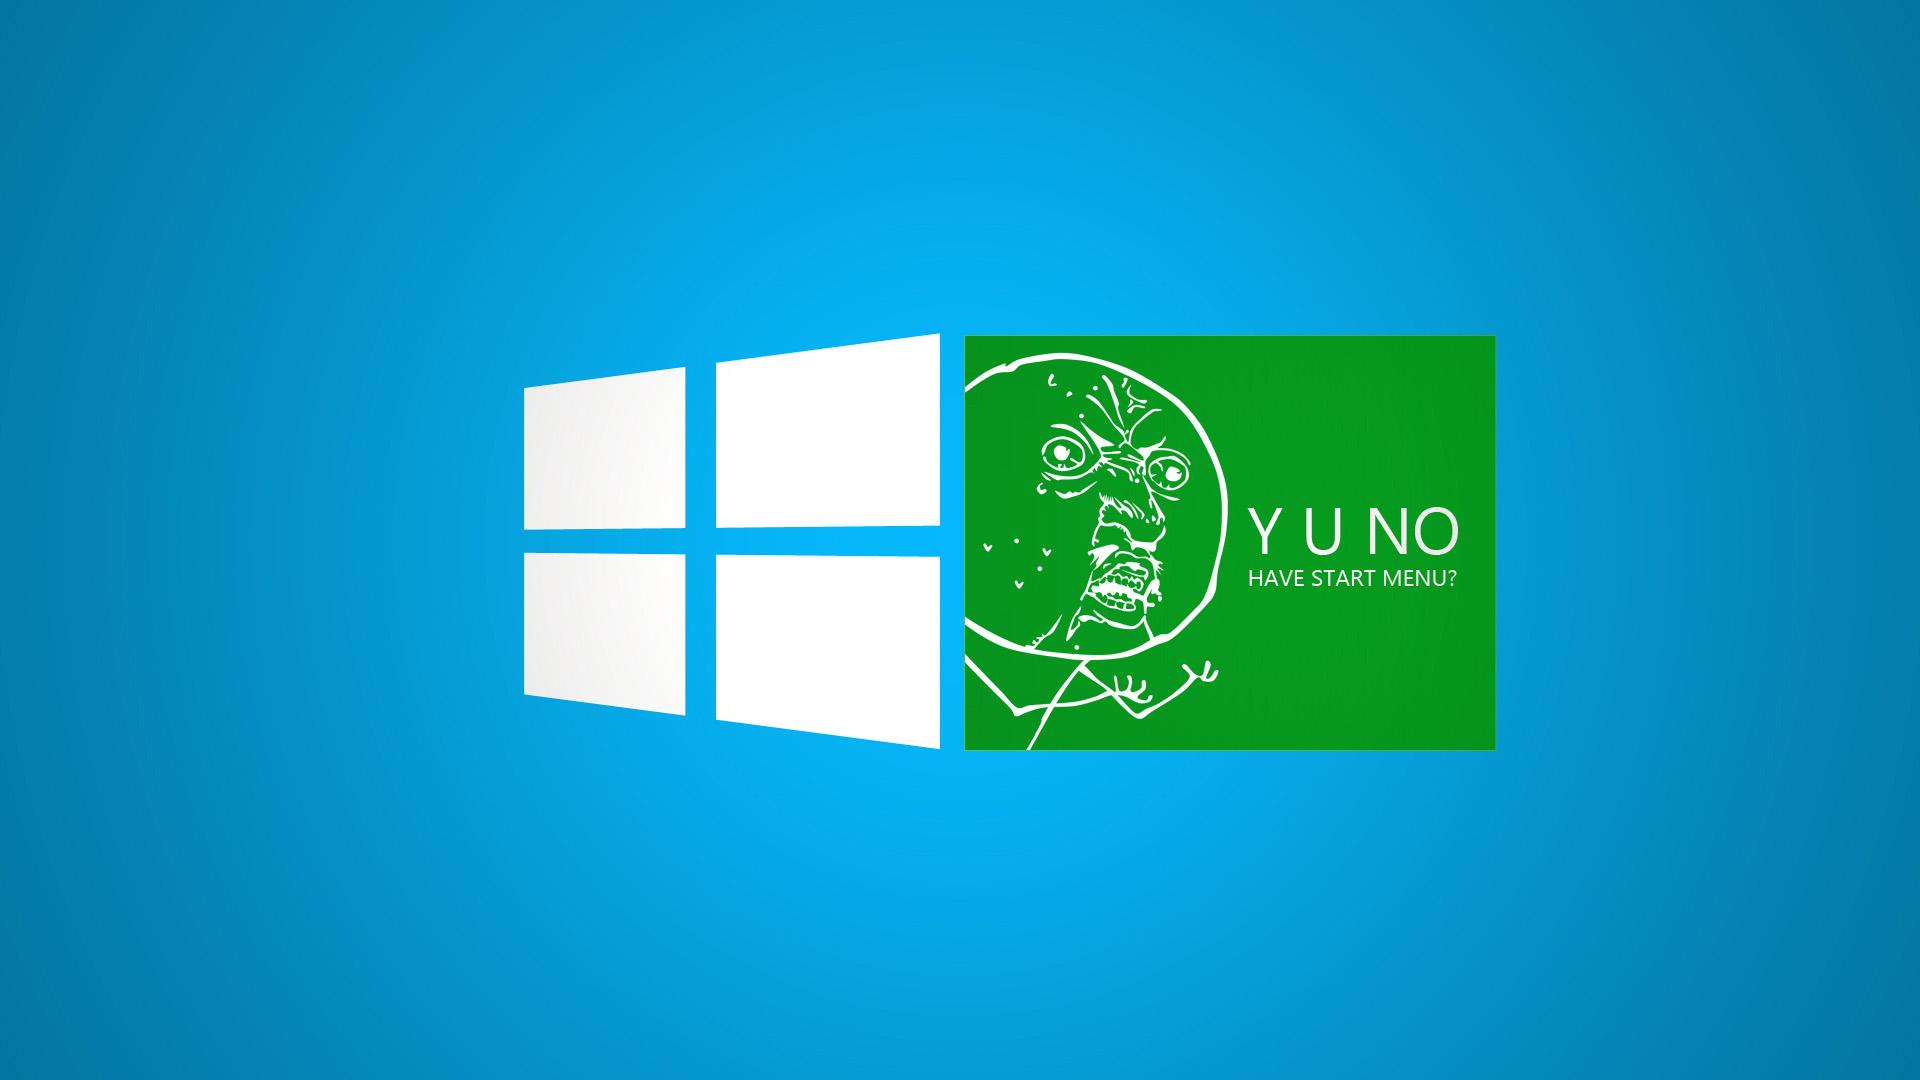 Funny Green Windows 8 Meme Desktop Wallpaper 1920x1080